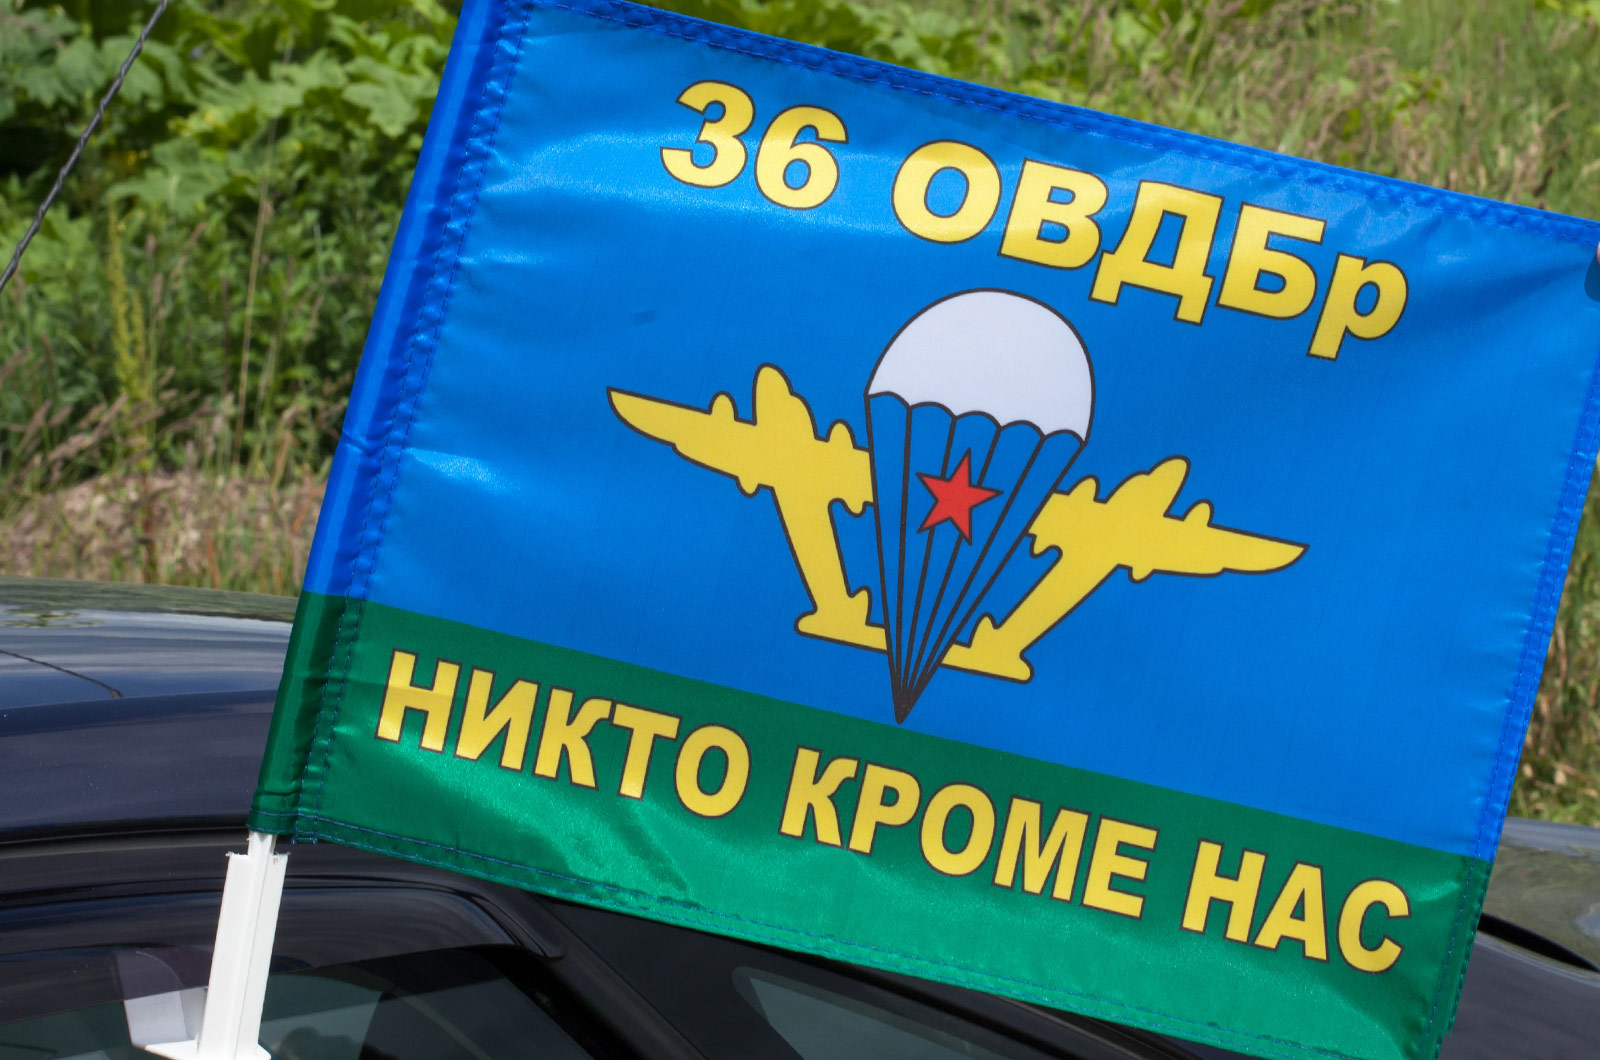 Флаг на машину с кронштейном ВДВ 36 ОВДБр